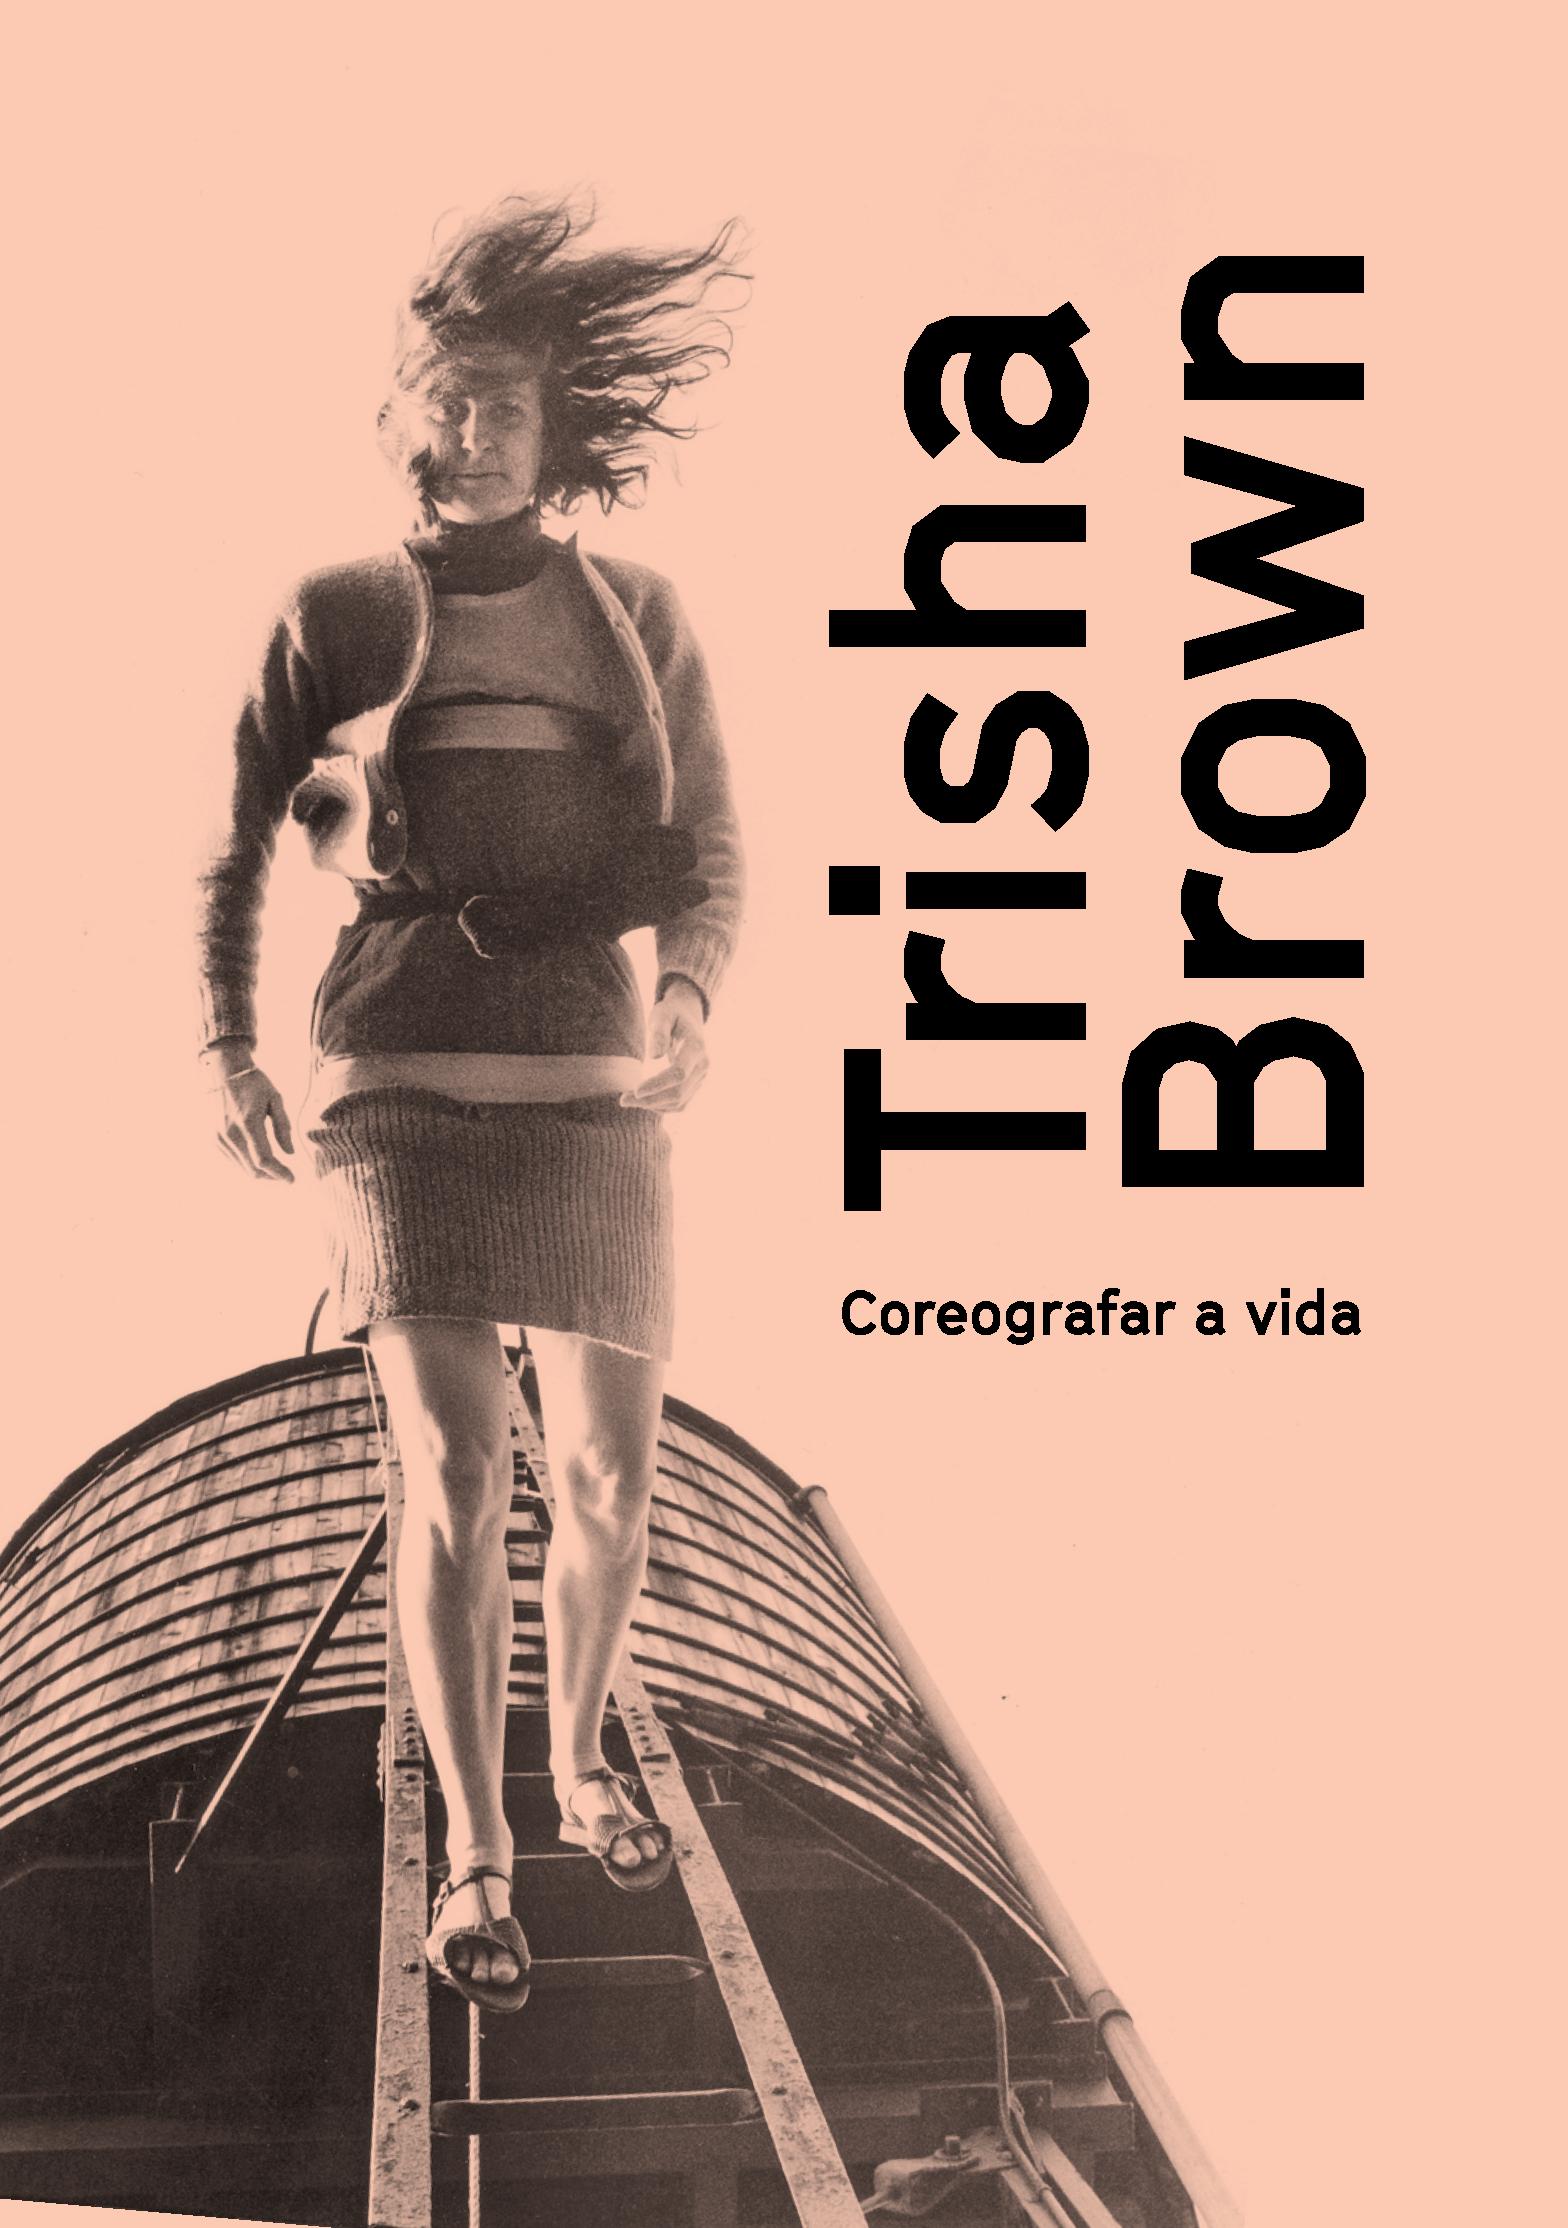 TRISHA BROWN: COREOGRAFAR A VIDA